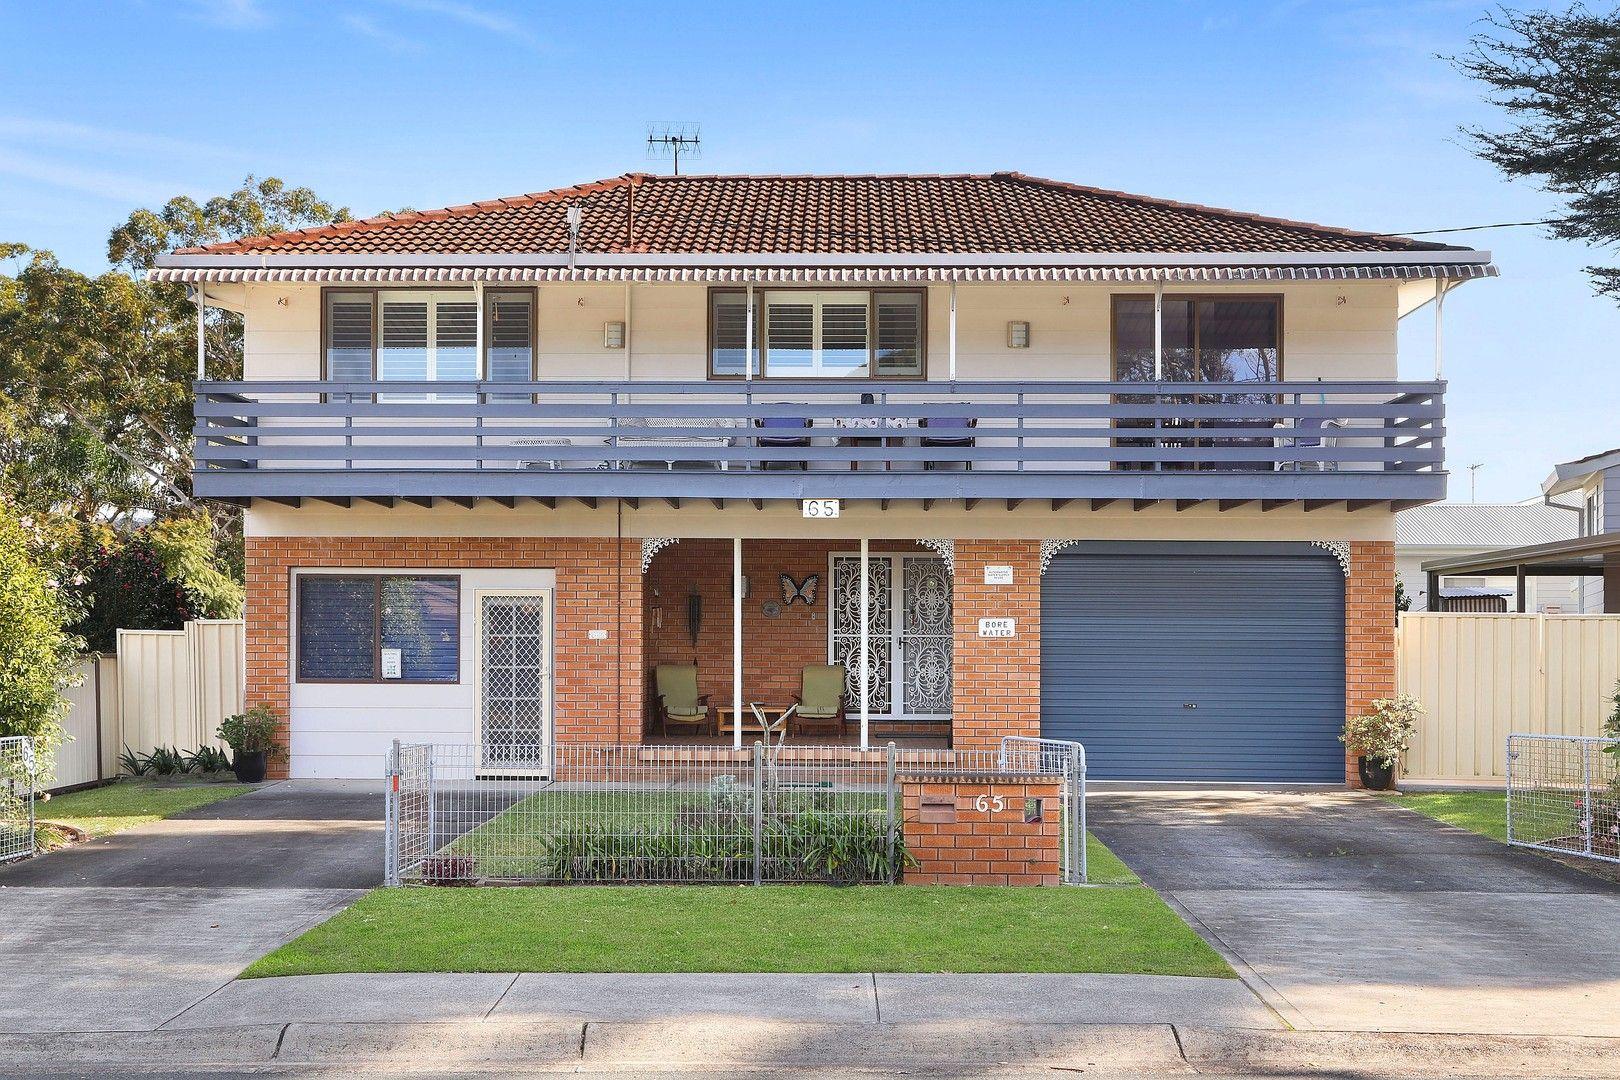 65 Springwood Street, Ettalong Beach NSW 2257, Image 0